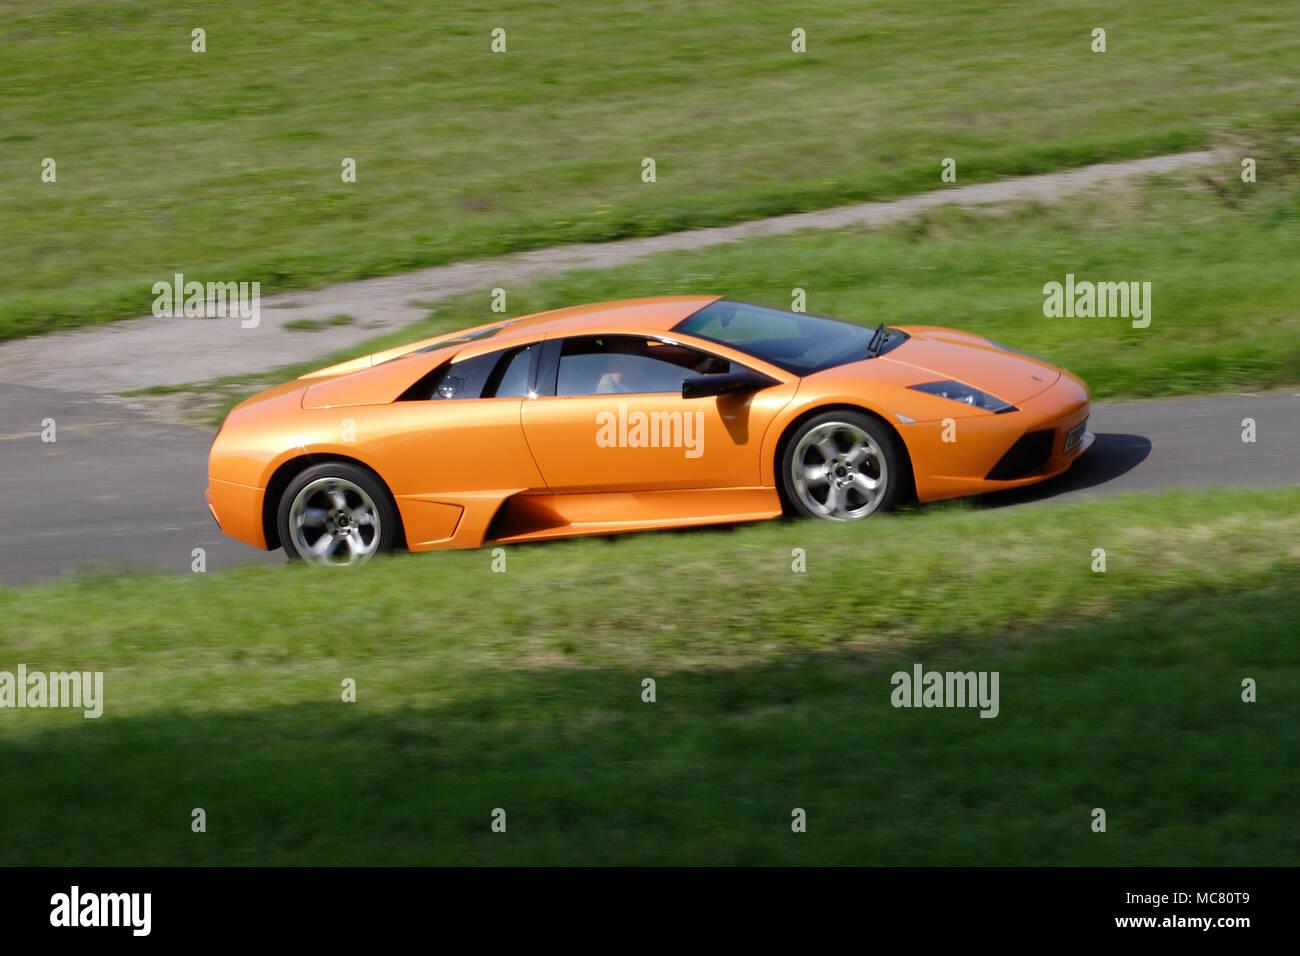 Orange Lamborghini Murcielago Driving Fast   Stock Image